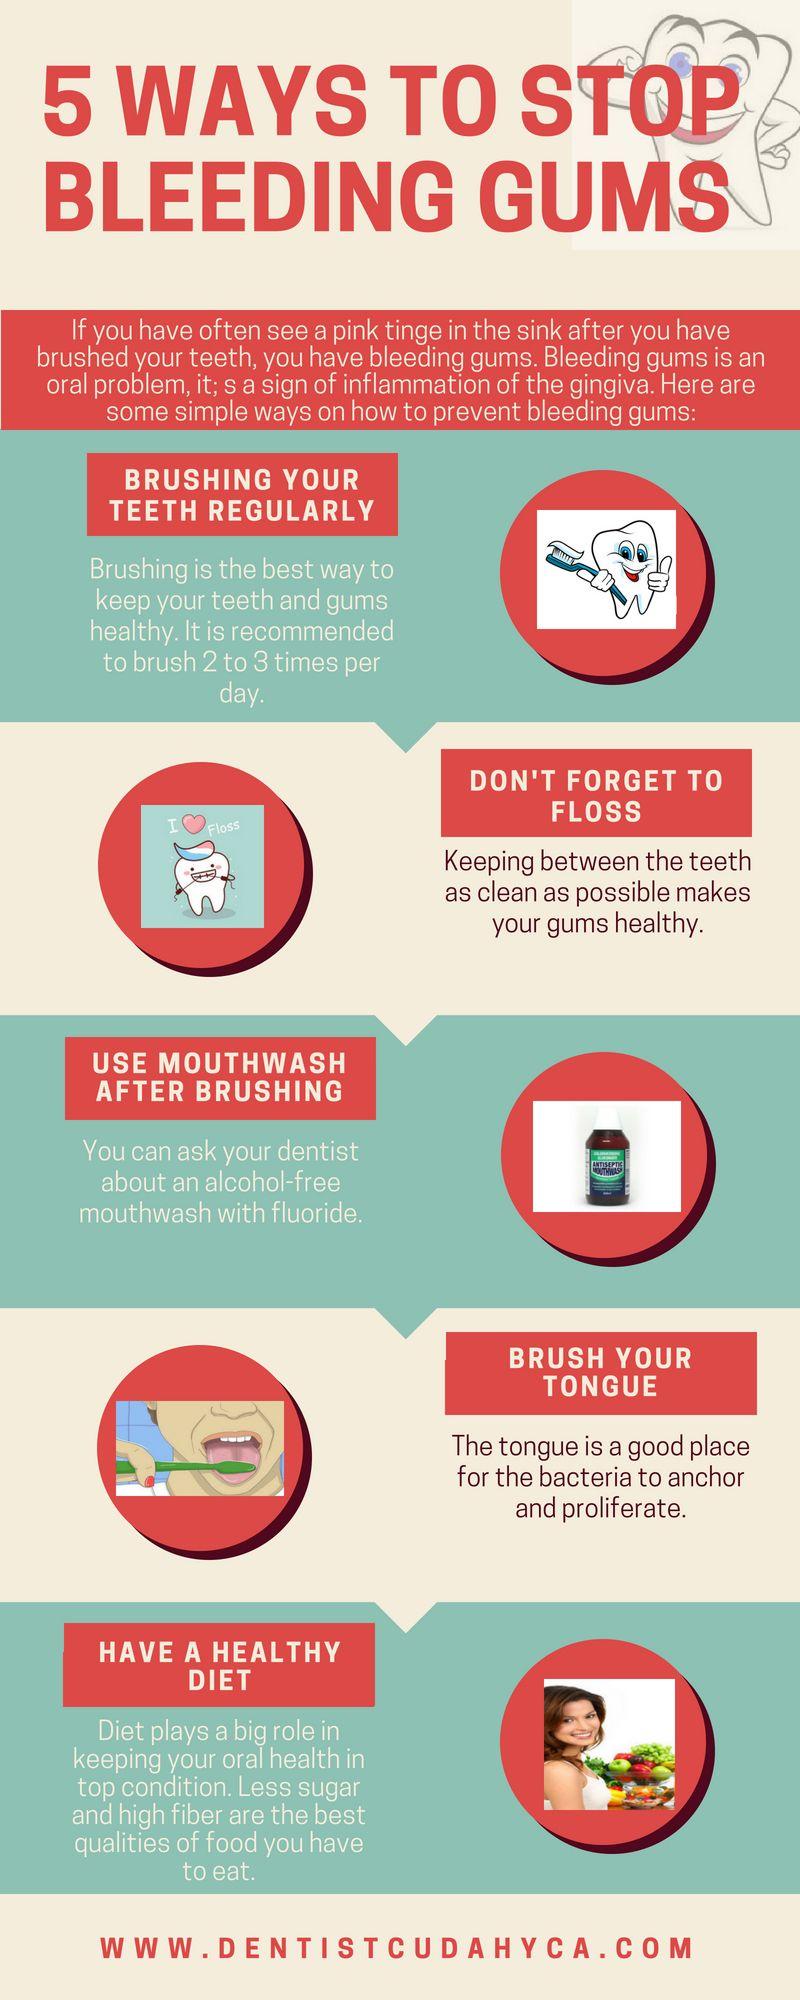 5 Ways To Stop Bleeding Gums Cudahy CA Bleeding gum